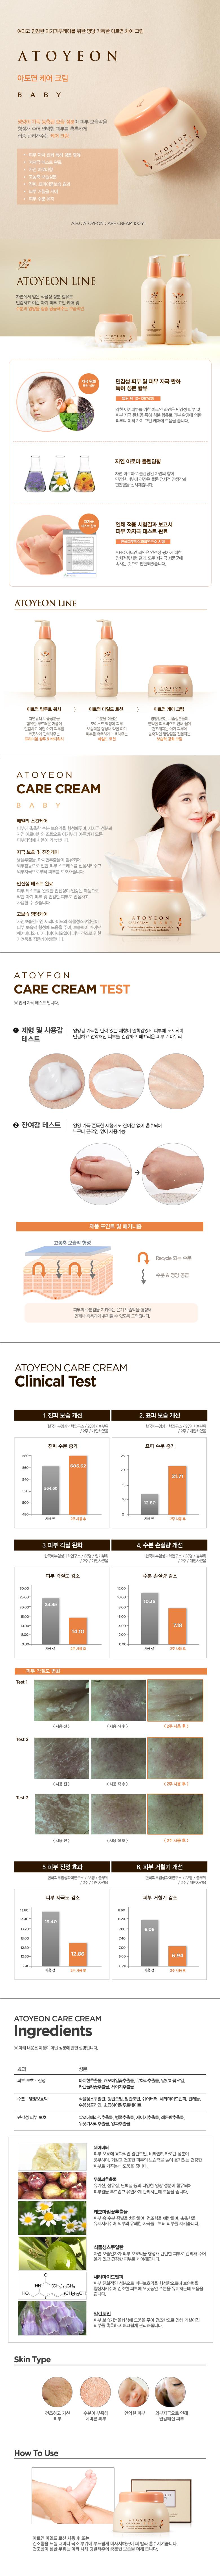 AHC Atoyeon Care Cream Baby 100ml malaysia singapore indonesia